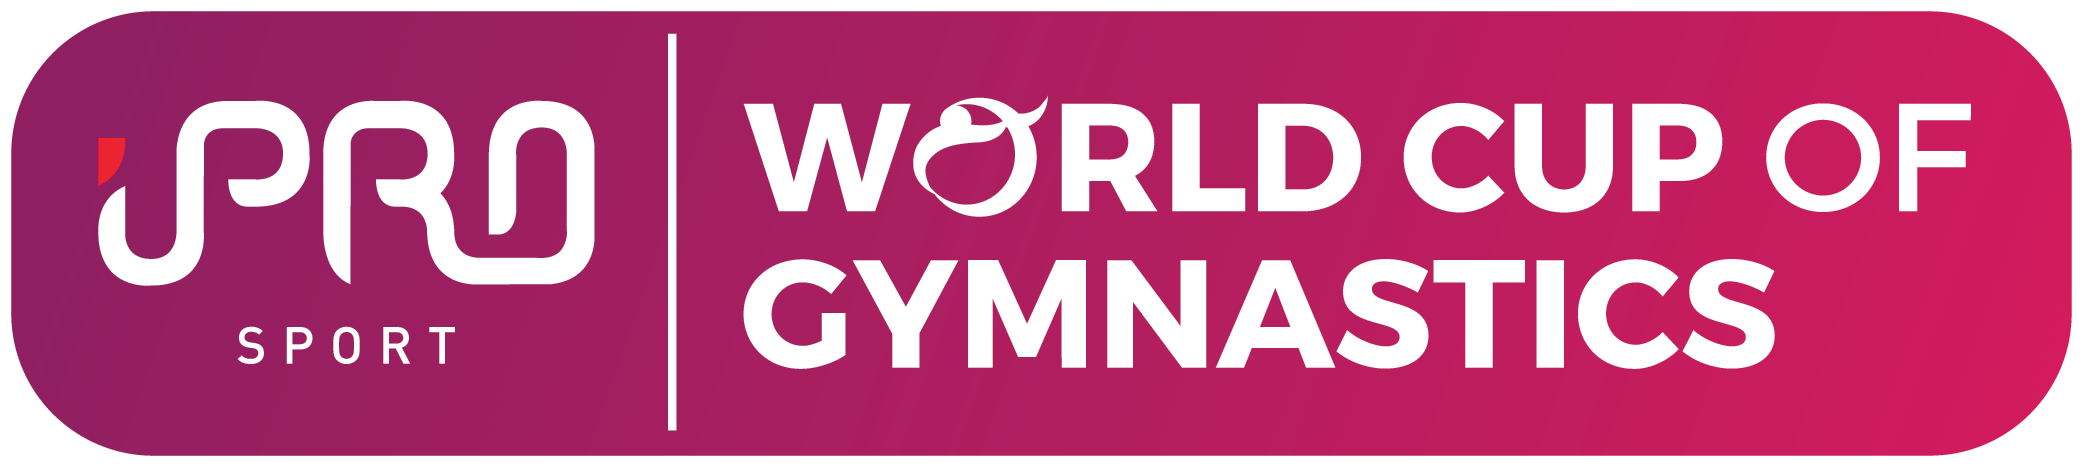 2017 World Cup of Gymnastics